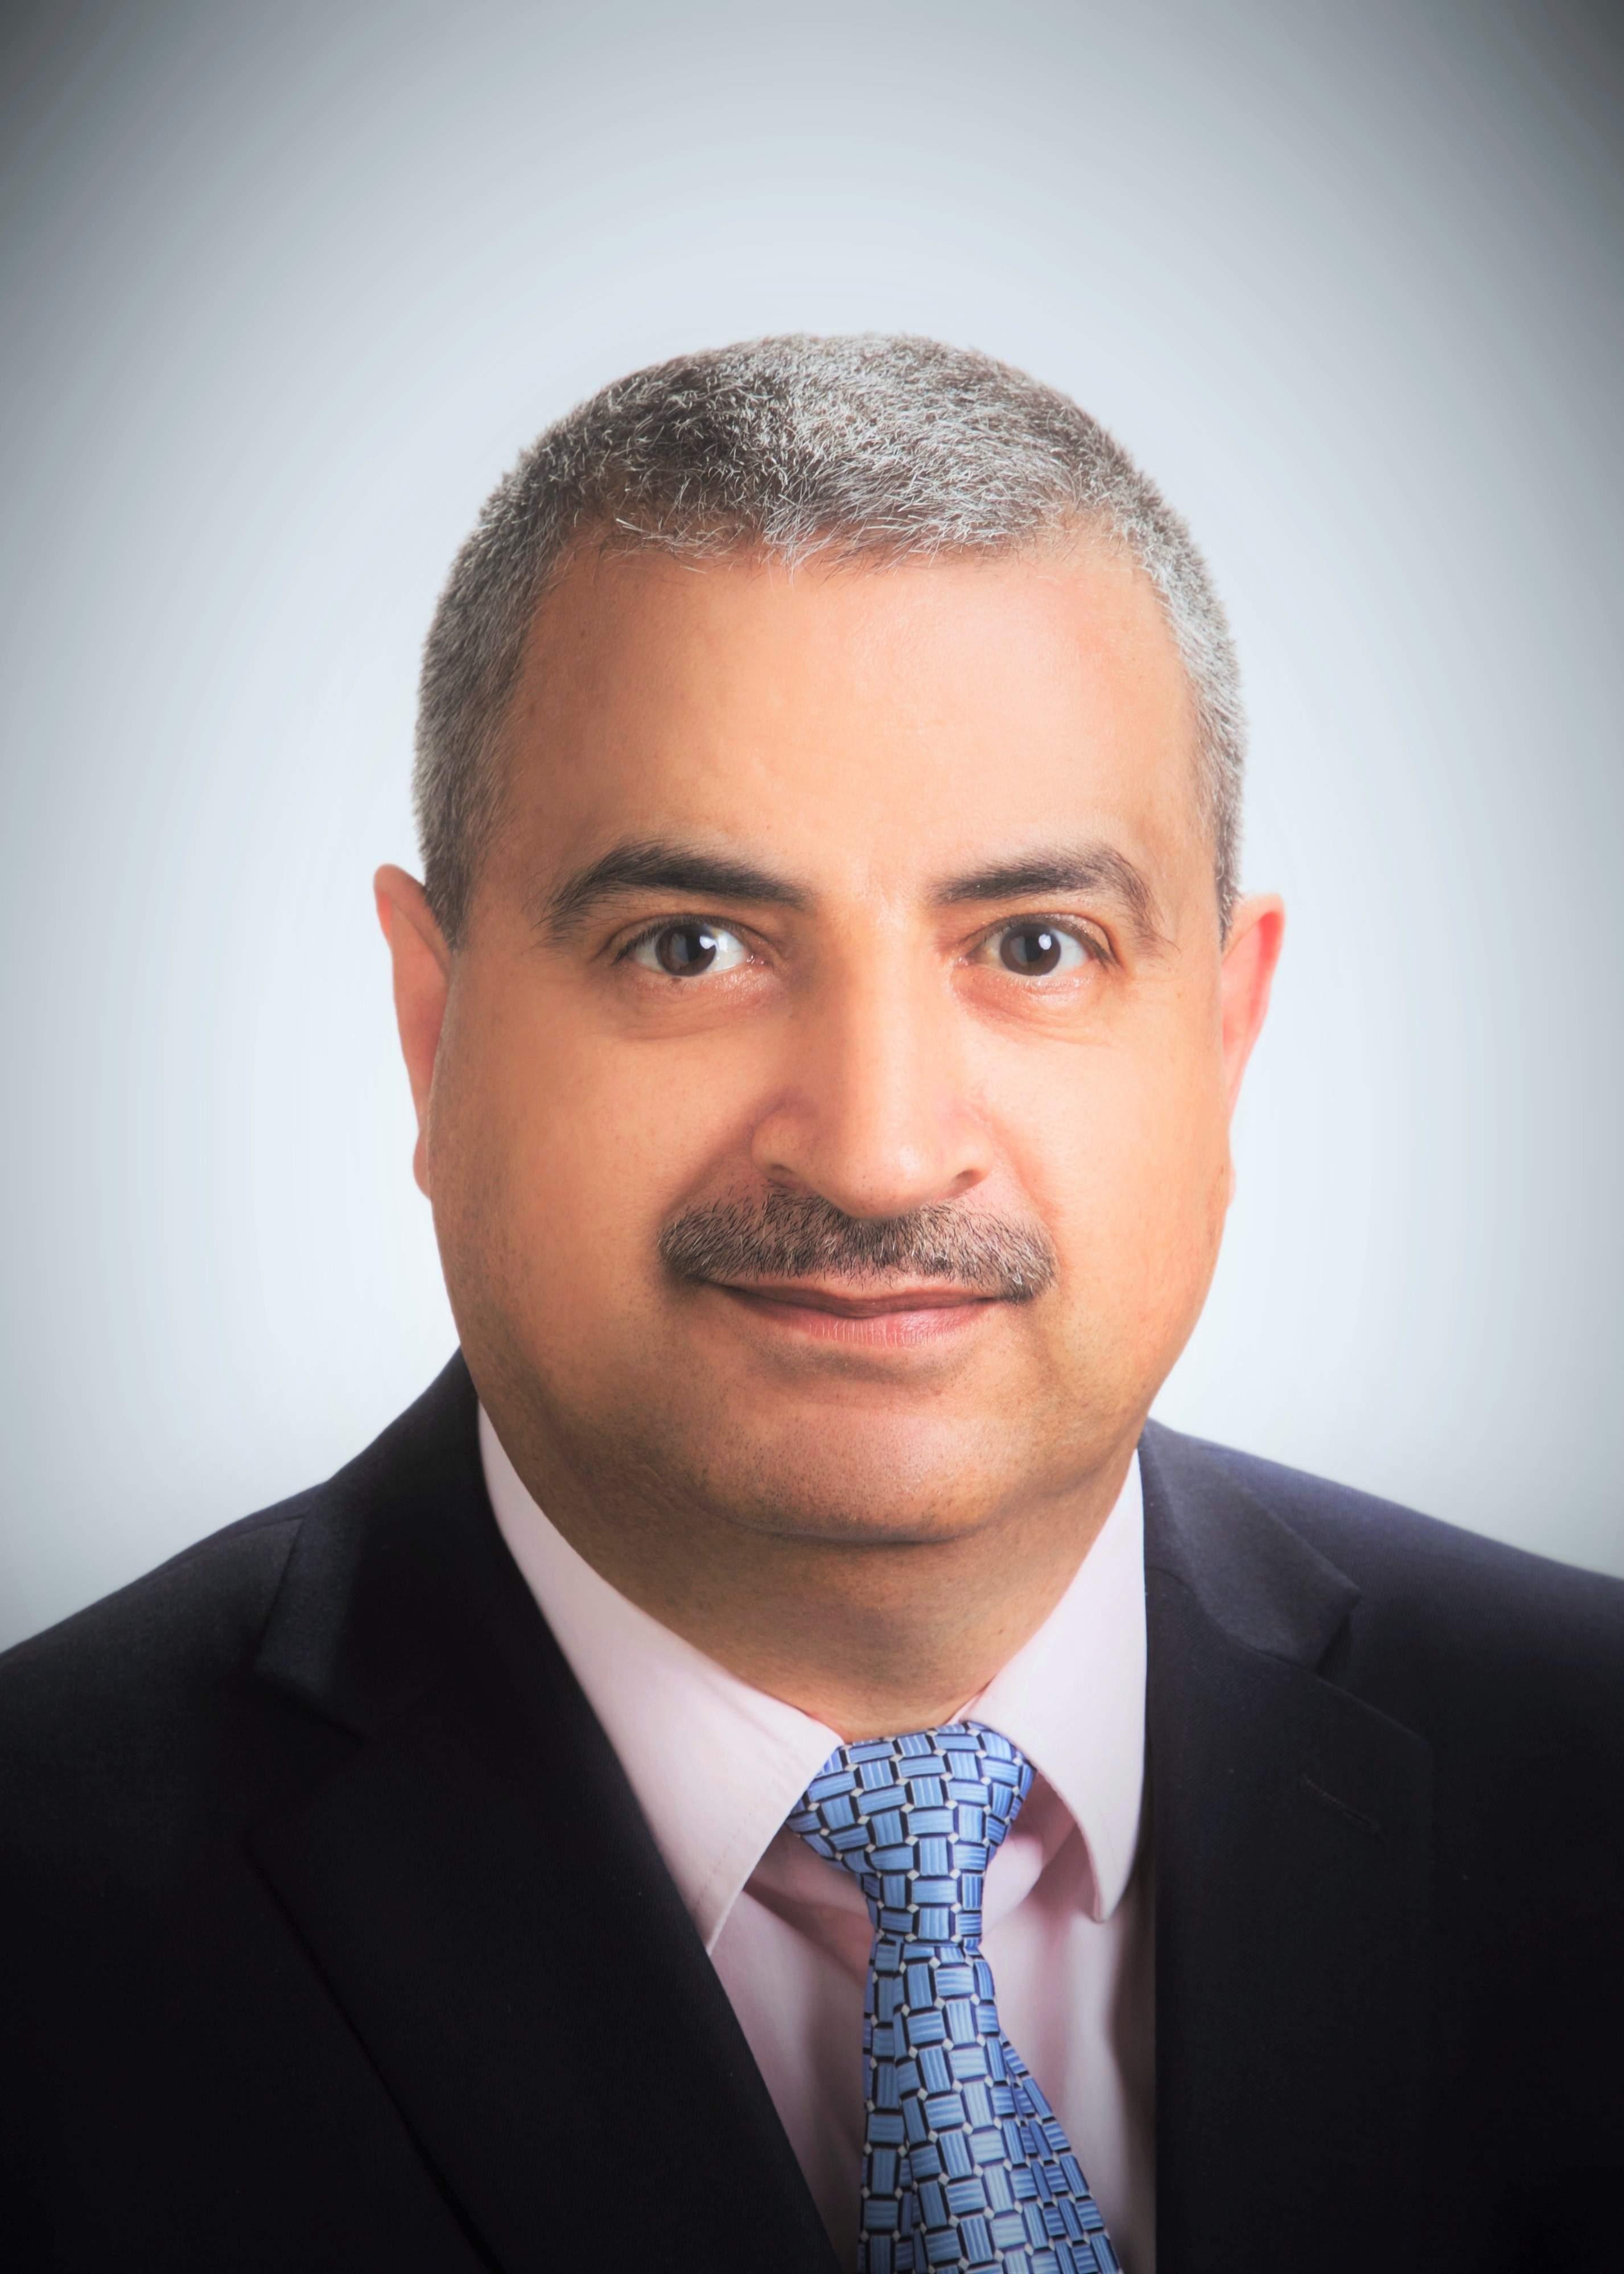 Dr. Bassam Abu-Abbas